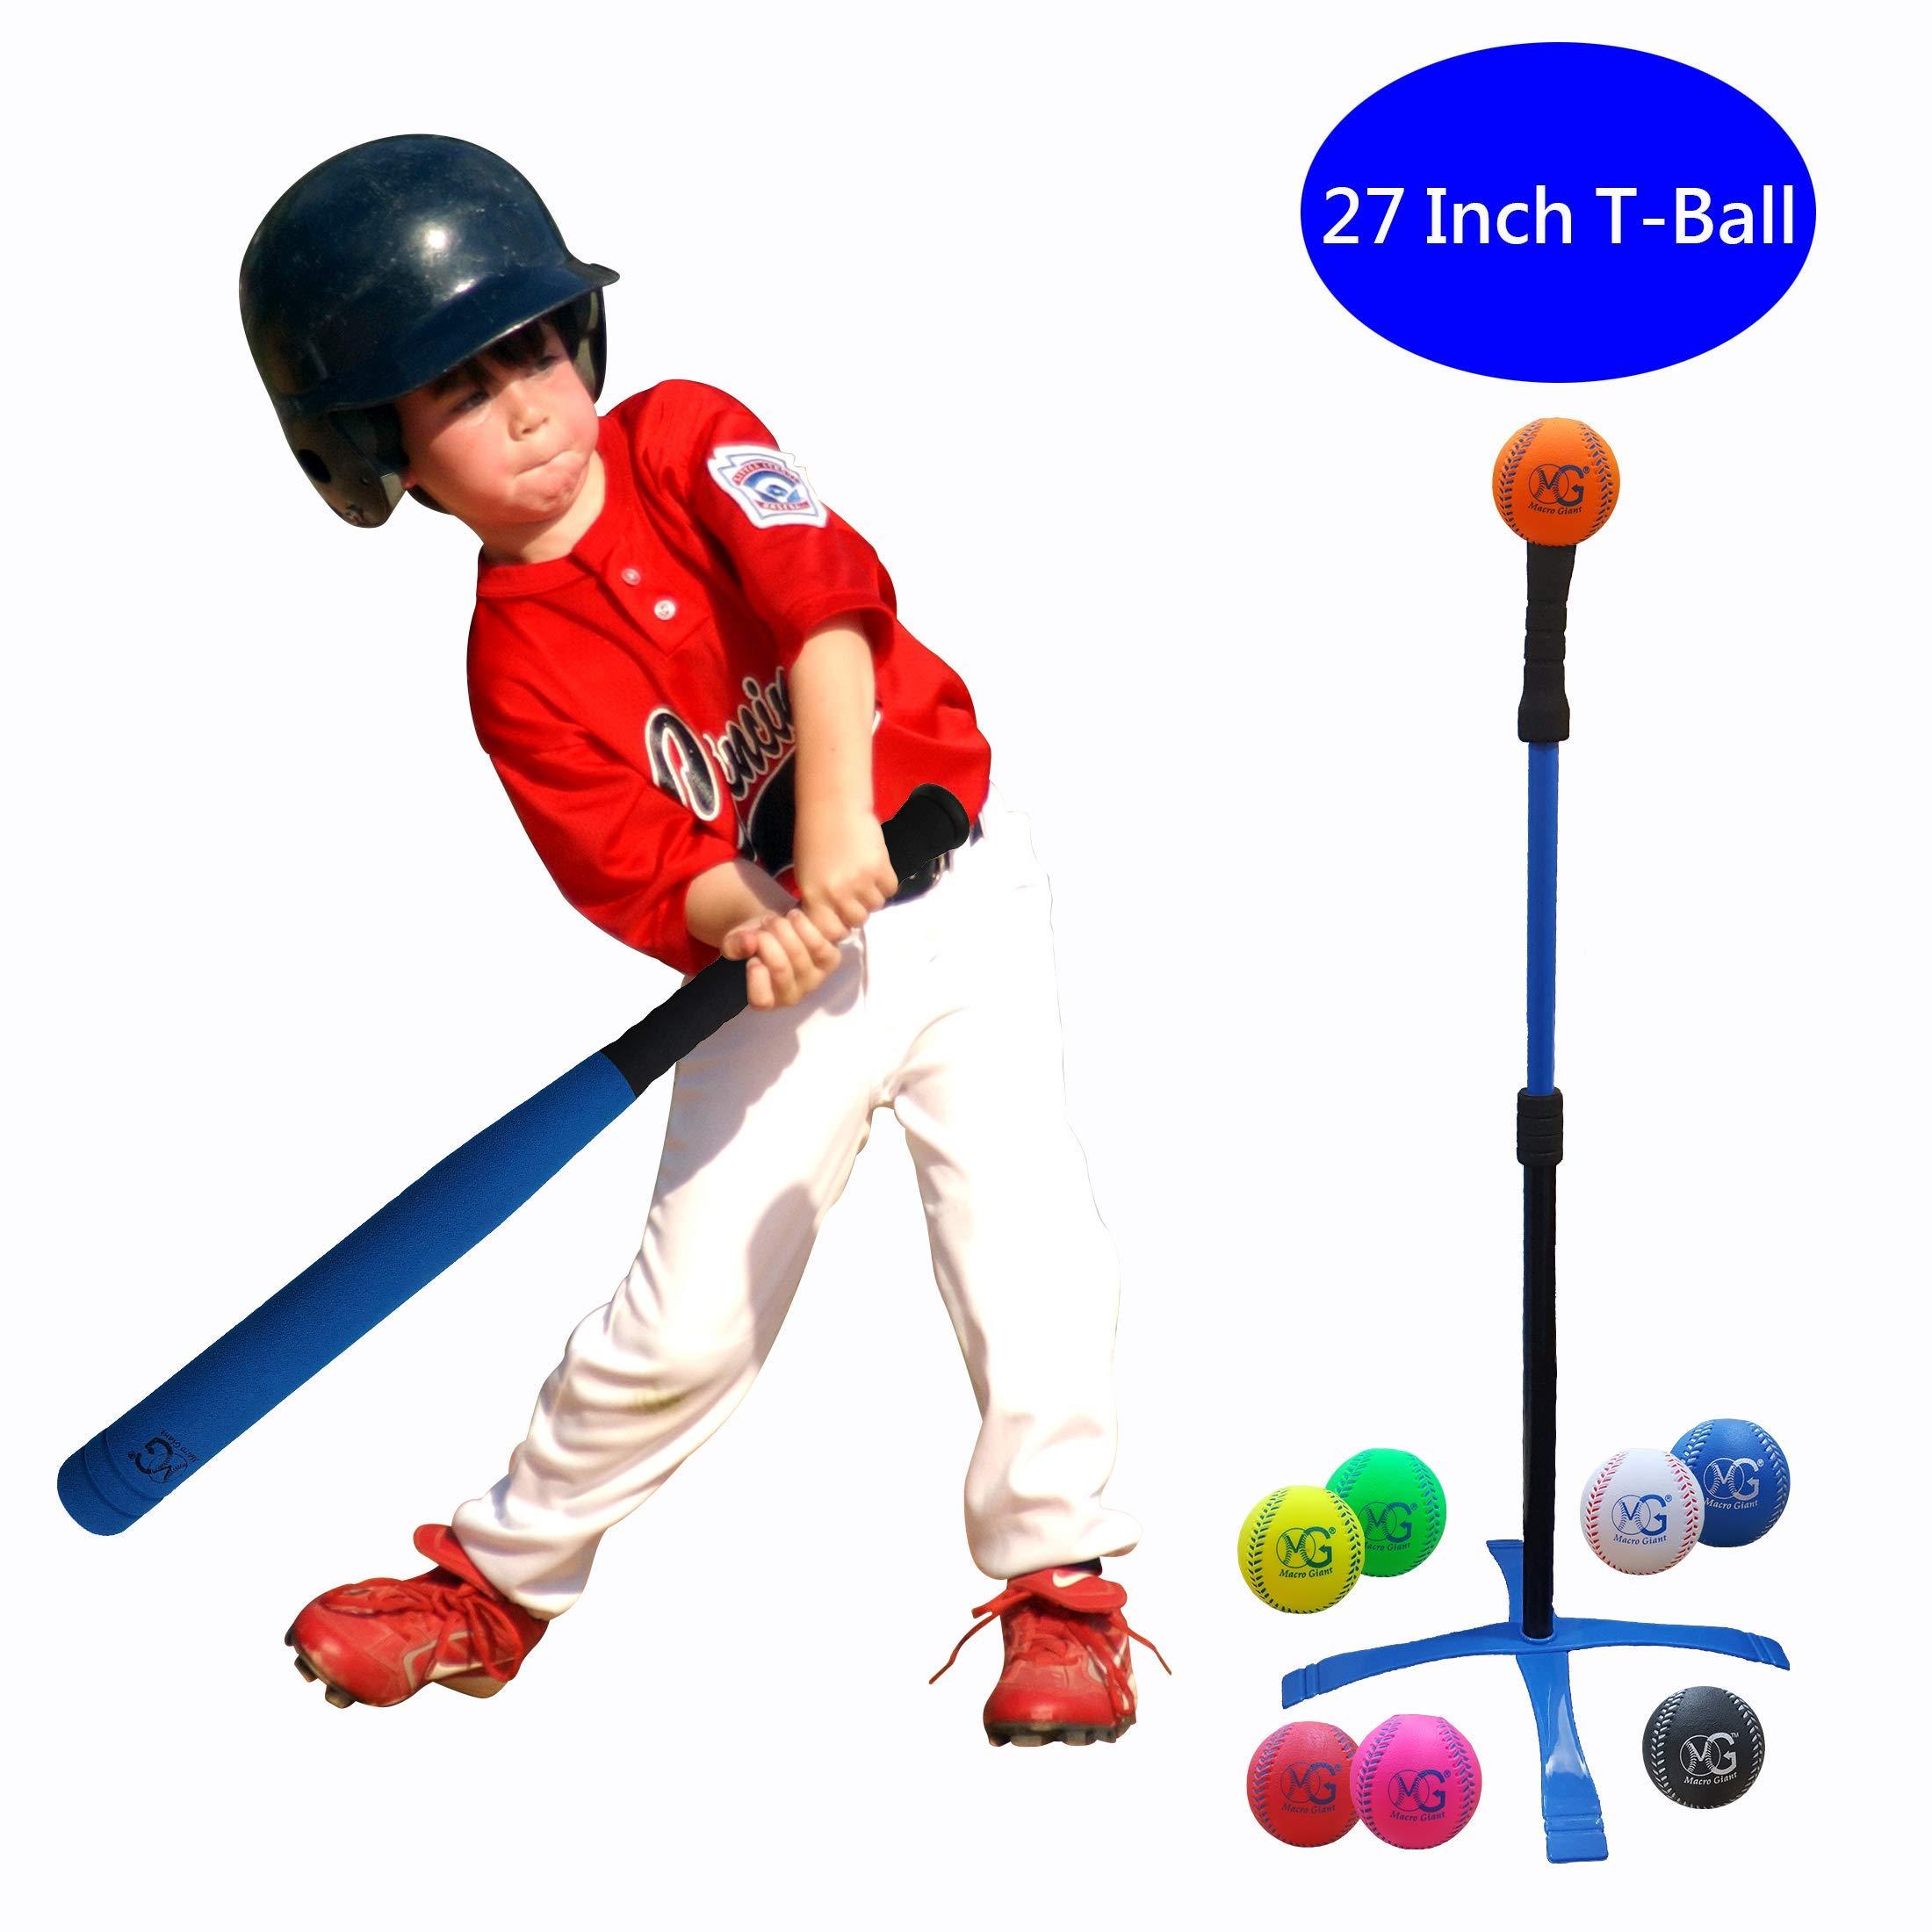 Macro Giant 27 Inch Safe T Ball, Tee Ball, T-Ball, 1 Blue Foam Bat & 8 Foam Baseballs, Training, Practice, Youth Batting Trainer Beginner, School Playground, Kid Gift, Birthday Gift by MG MACRO GIANT